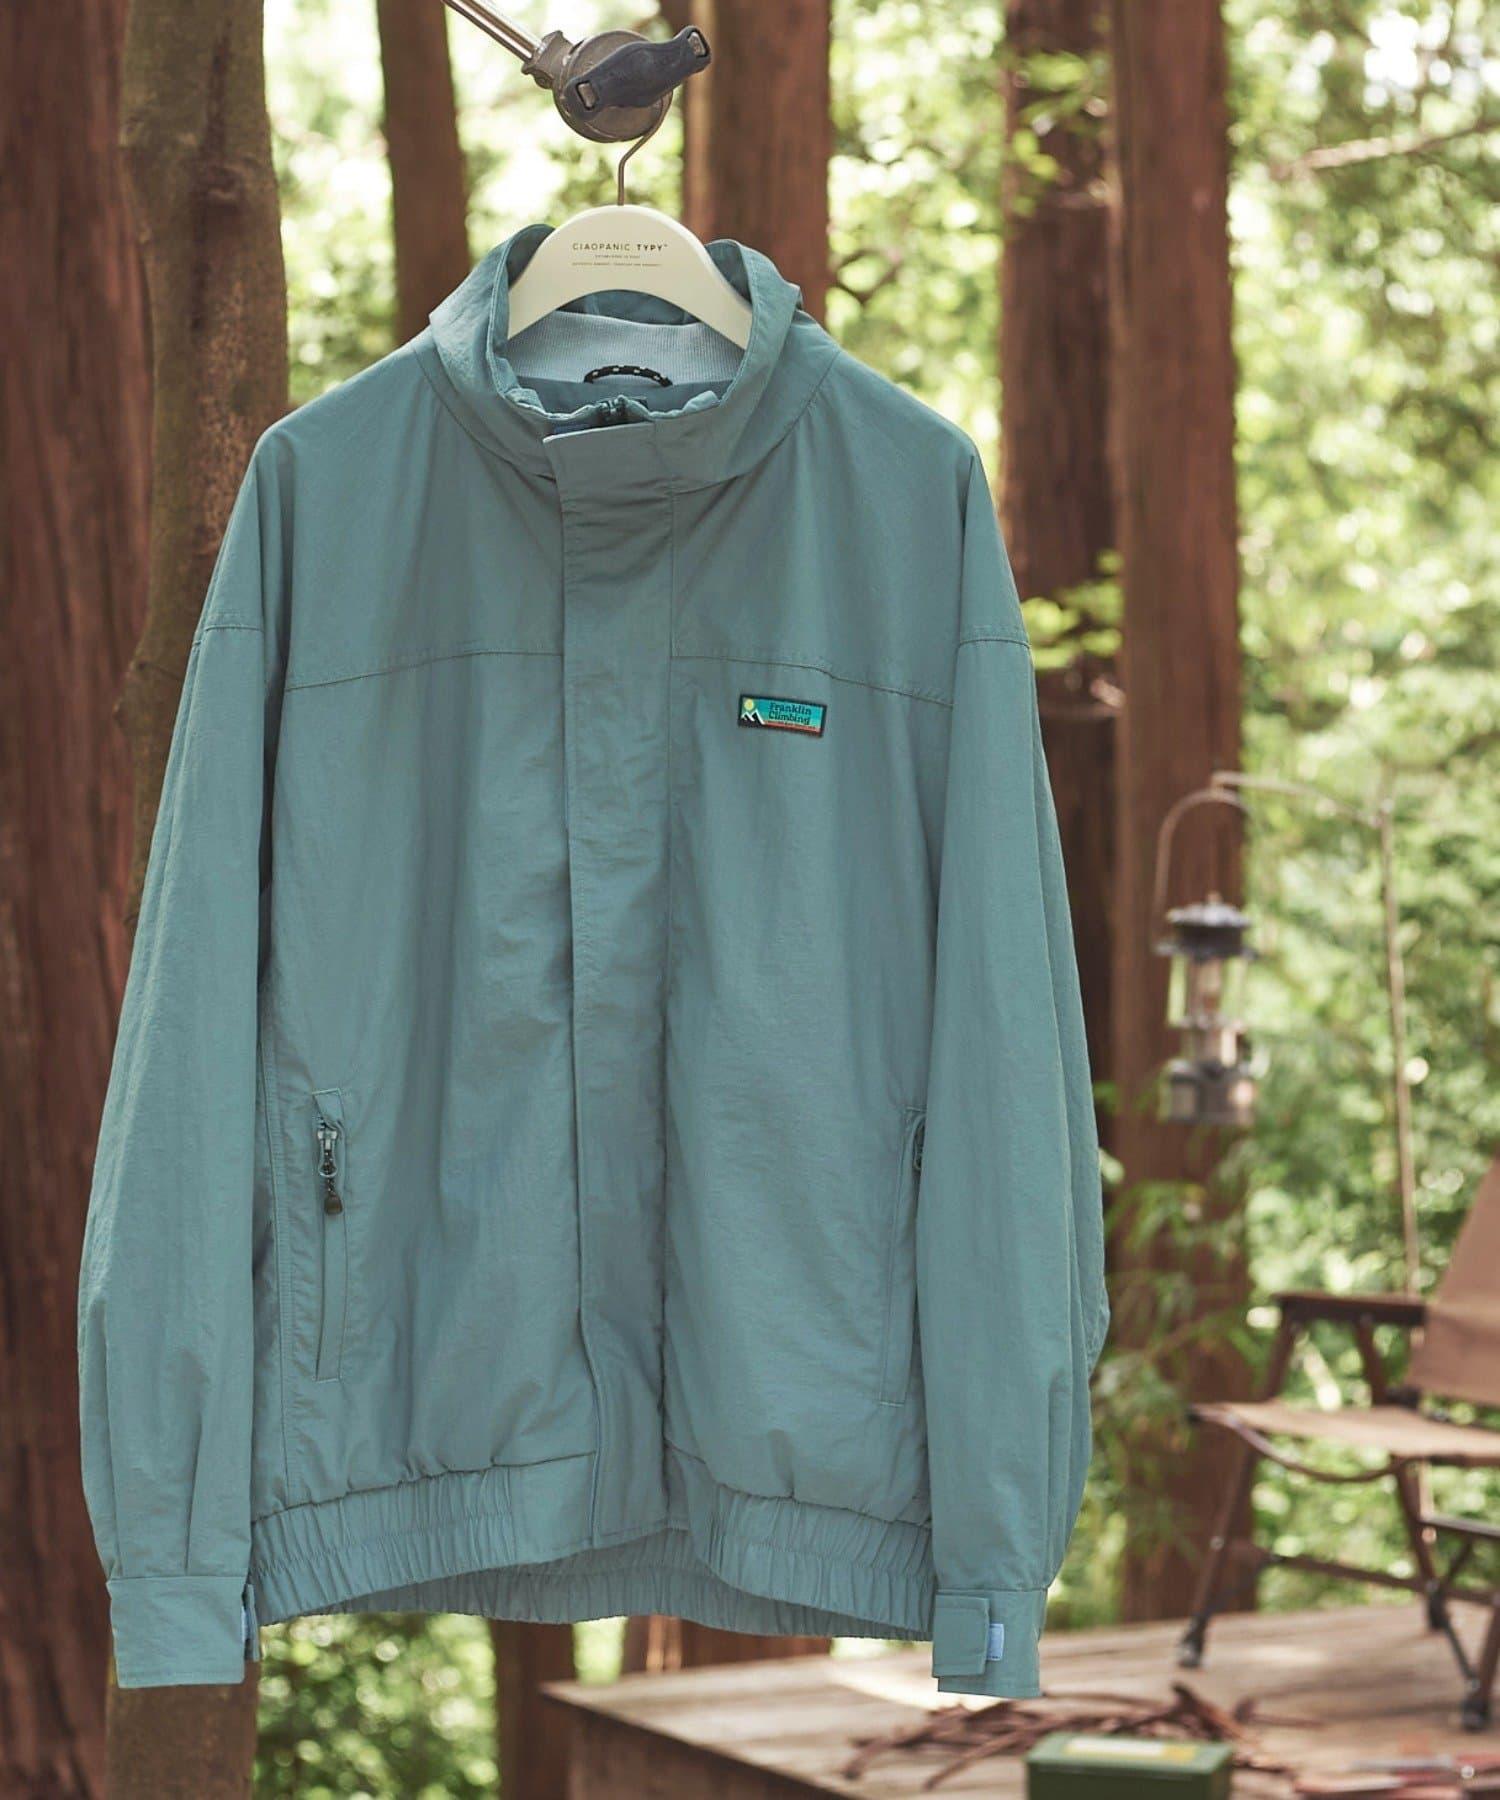 CIAOPANIC TYPY(チャオパニックティピー) 【Franklin Climbing】スタンドジャケット